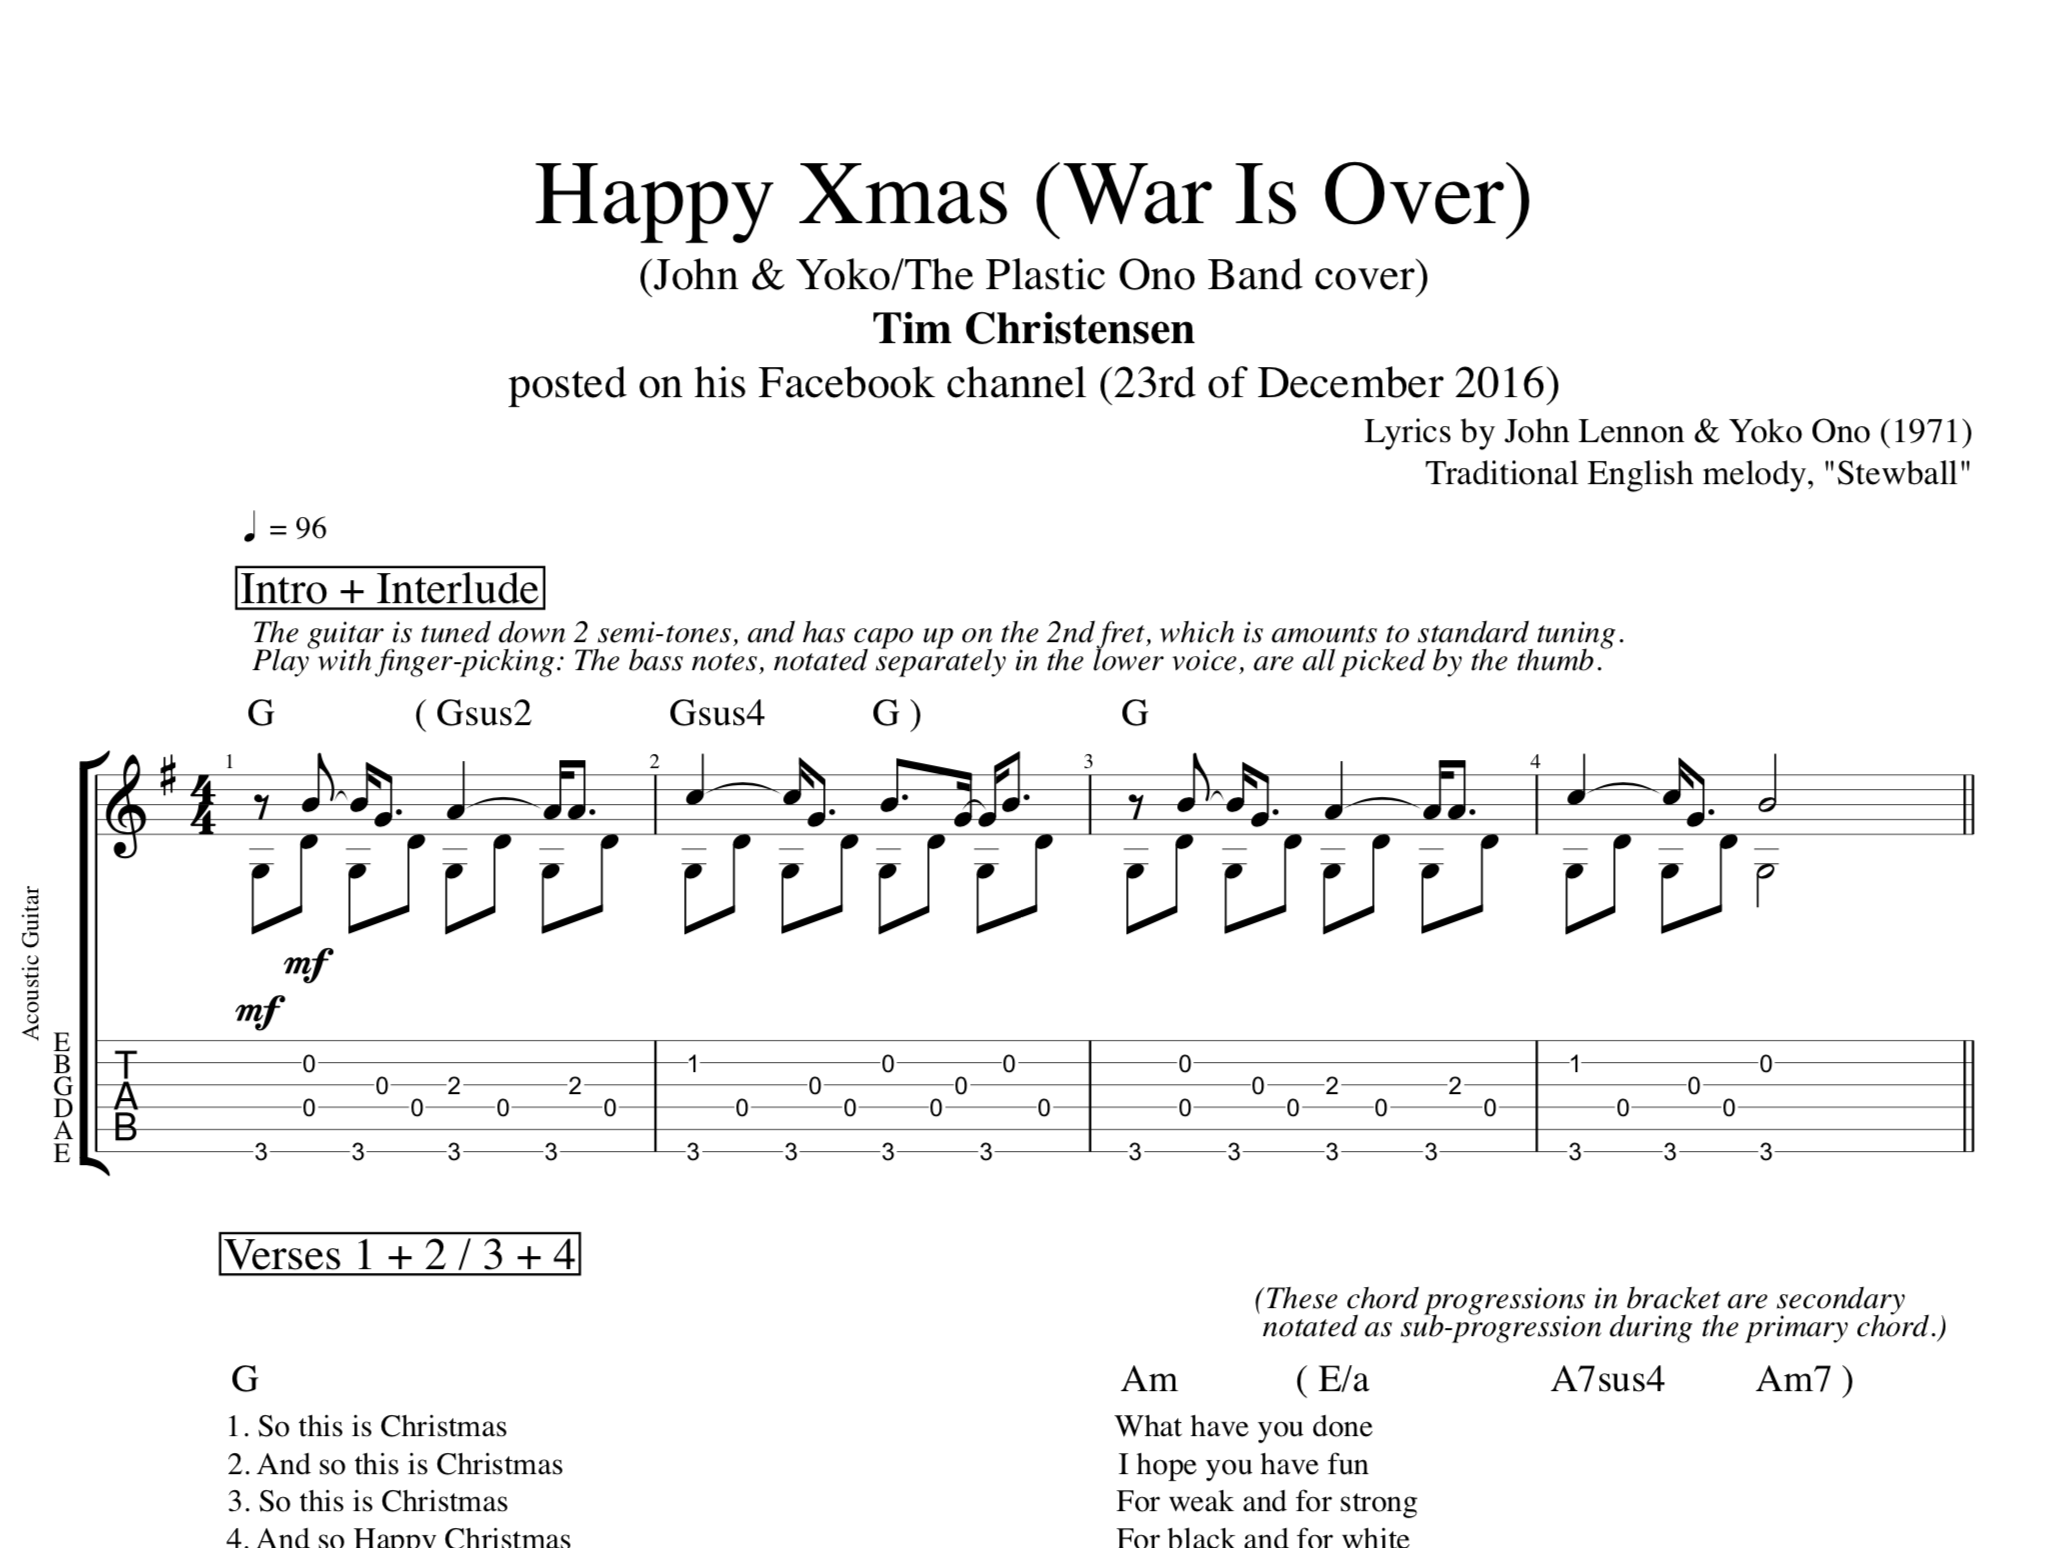 Christmas Guitar Tabs.Happy Xmas War Is Over By Tim Christensen Guitar Tab Chords Lyrics Play Like The Greats Com